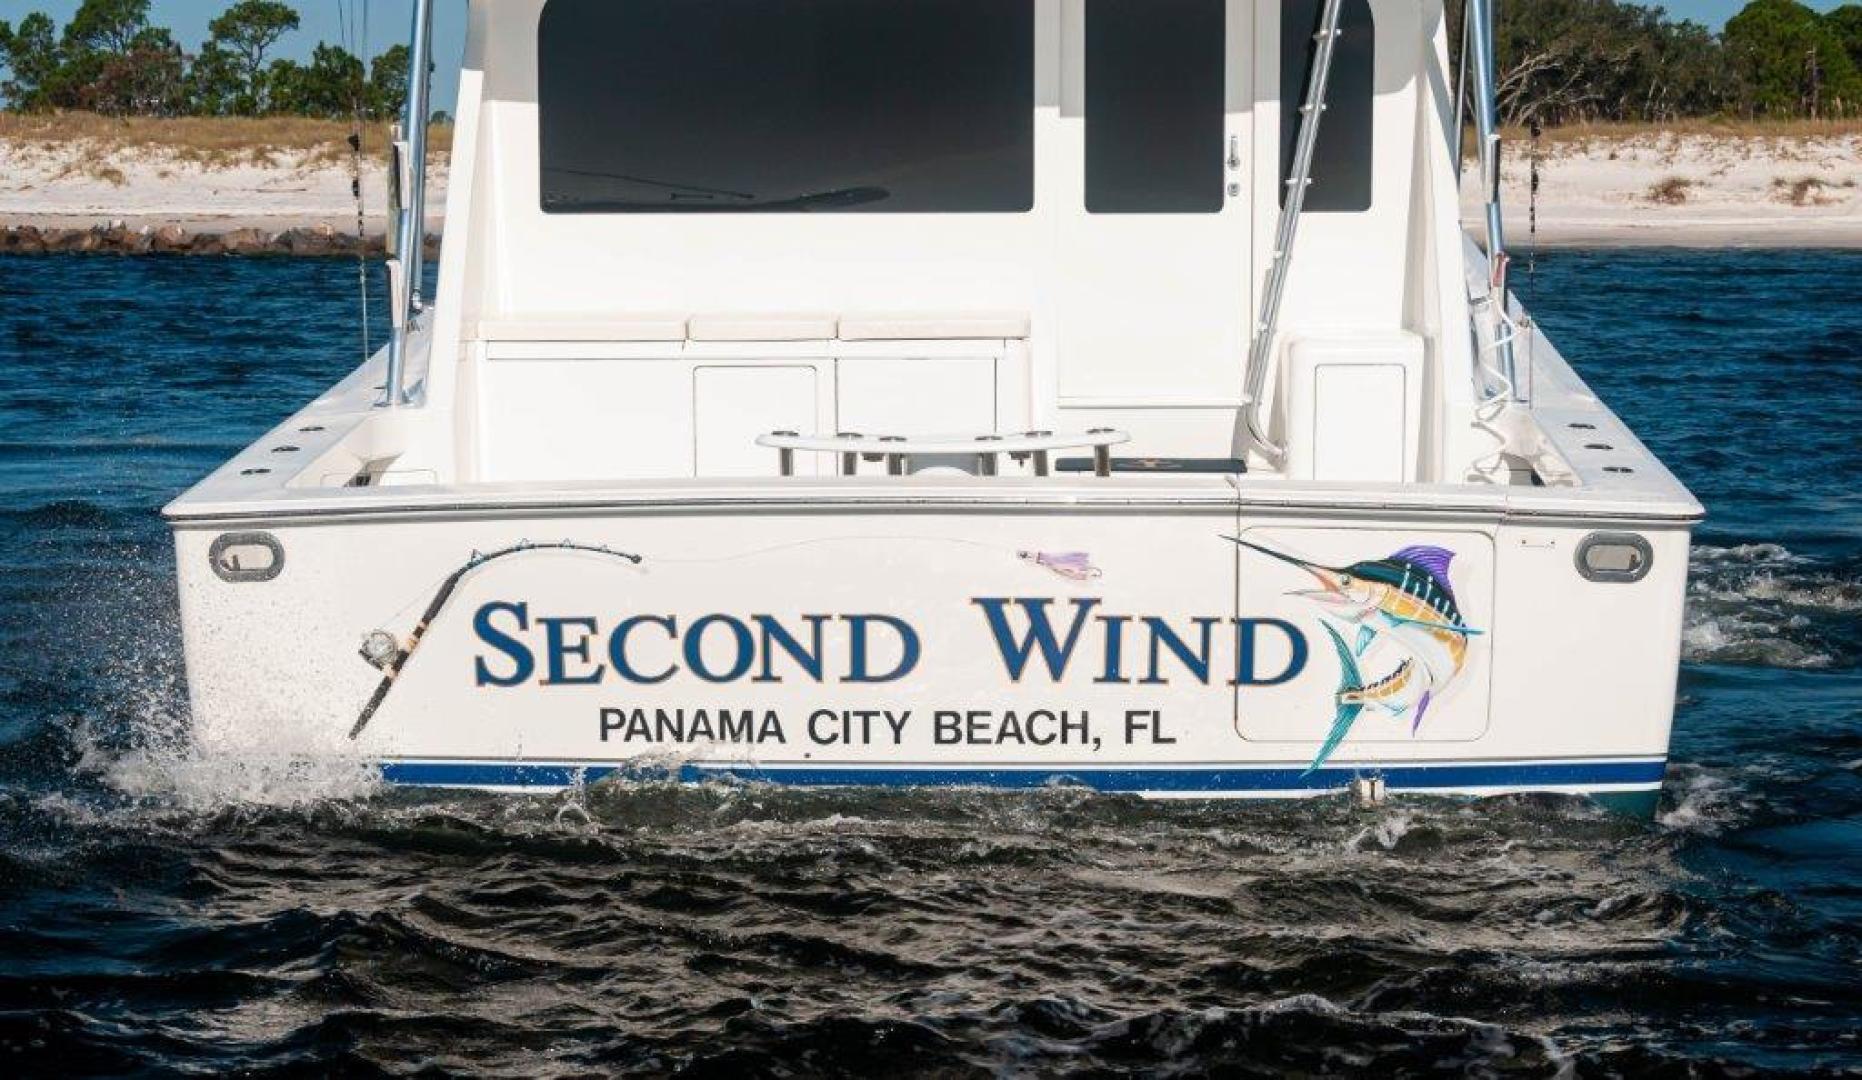 Viking-61 Convertible 2004-Second Wind Panama City Beach-Florida-United States-2004 61 Viking Convertible Second Wind Transom (3)-1545123 | Thumbnail